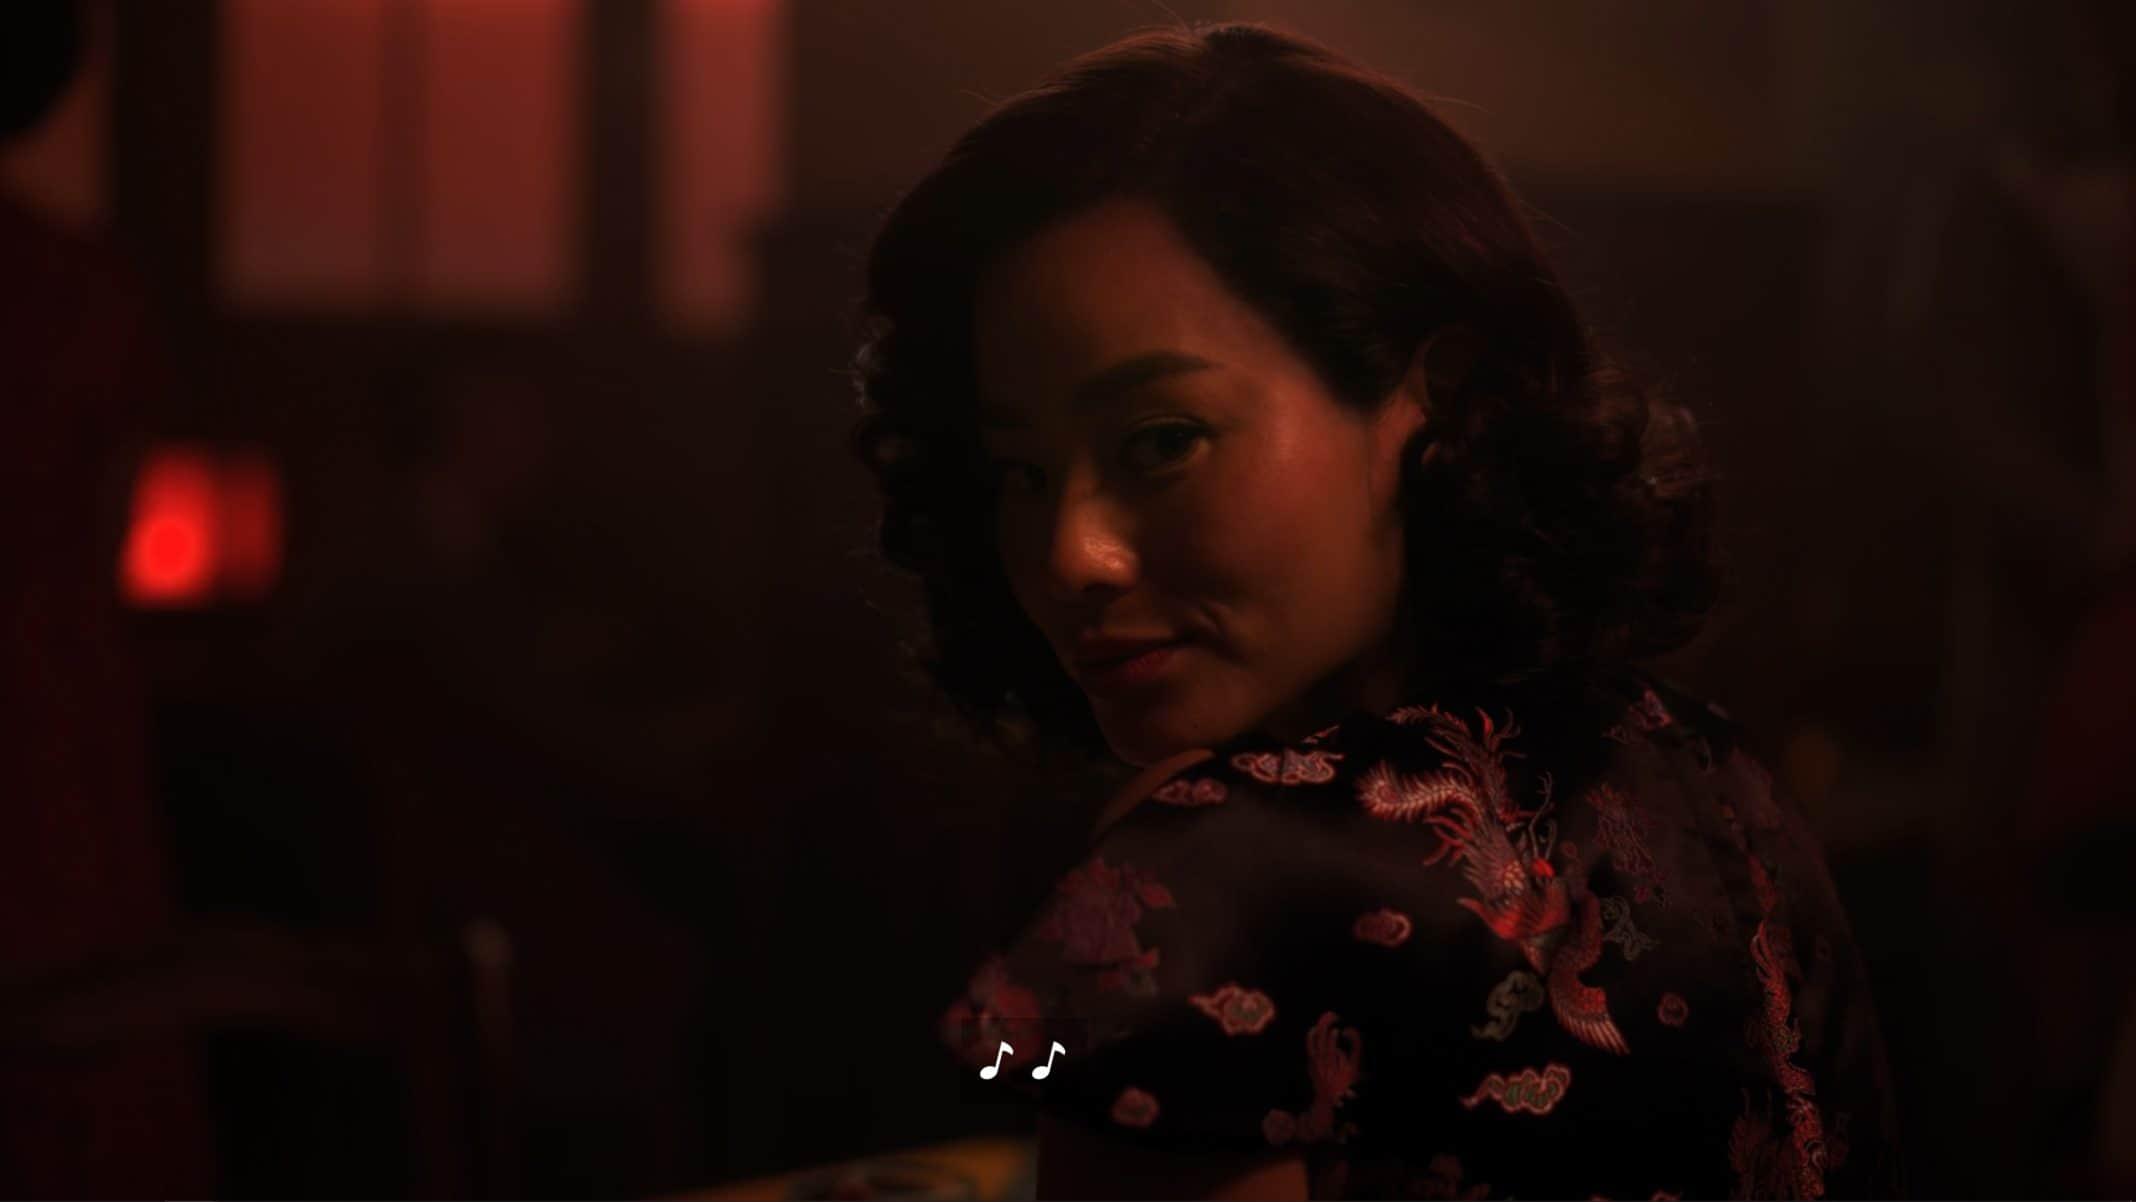 Ji-ah (Jamie Chung) looking over her shoulder.